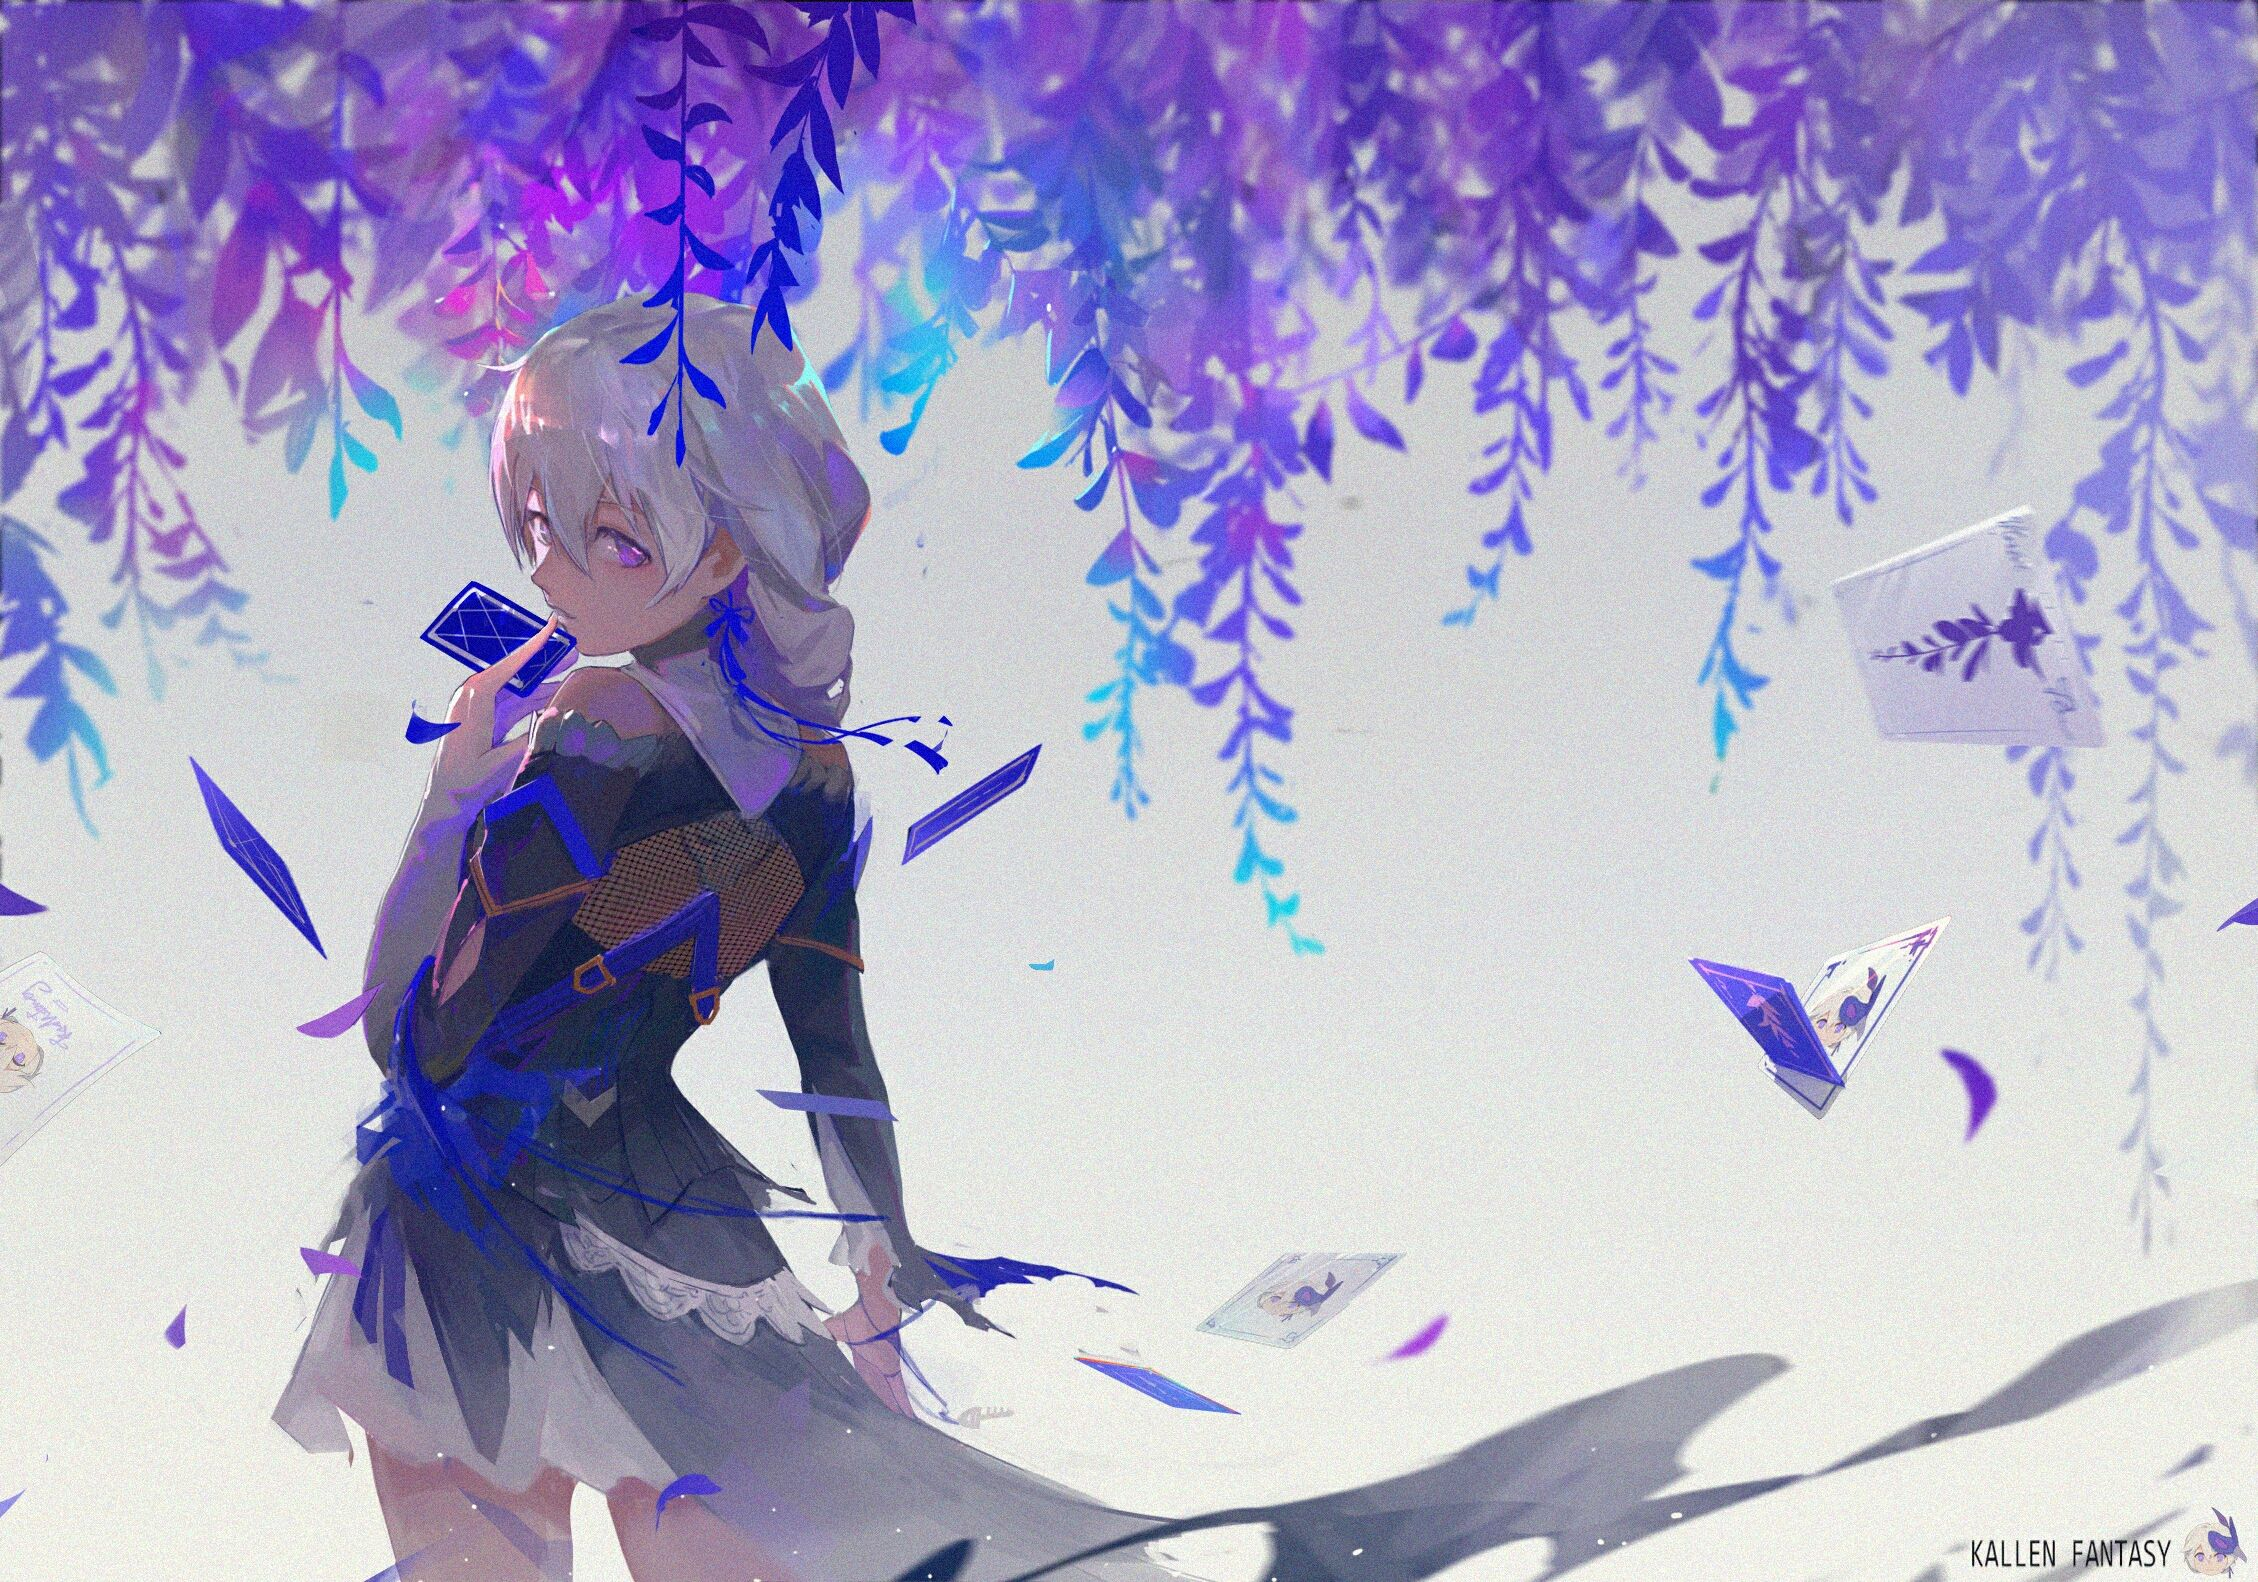 Pin By Mia Brooklyn On Honkai Impact In 2020 Anime Images Anime Anime Art Beautiful